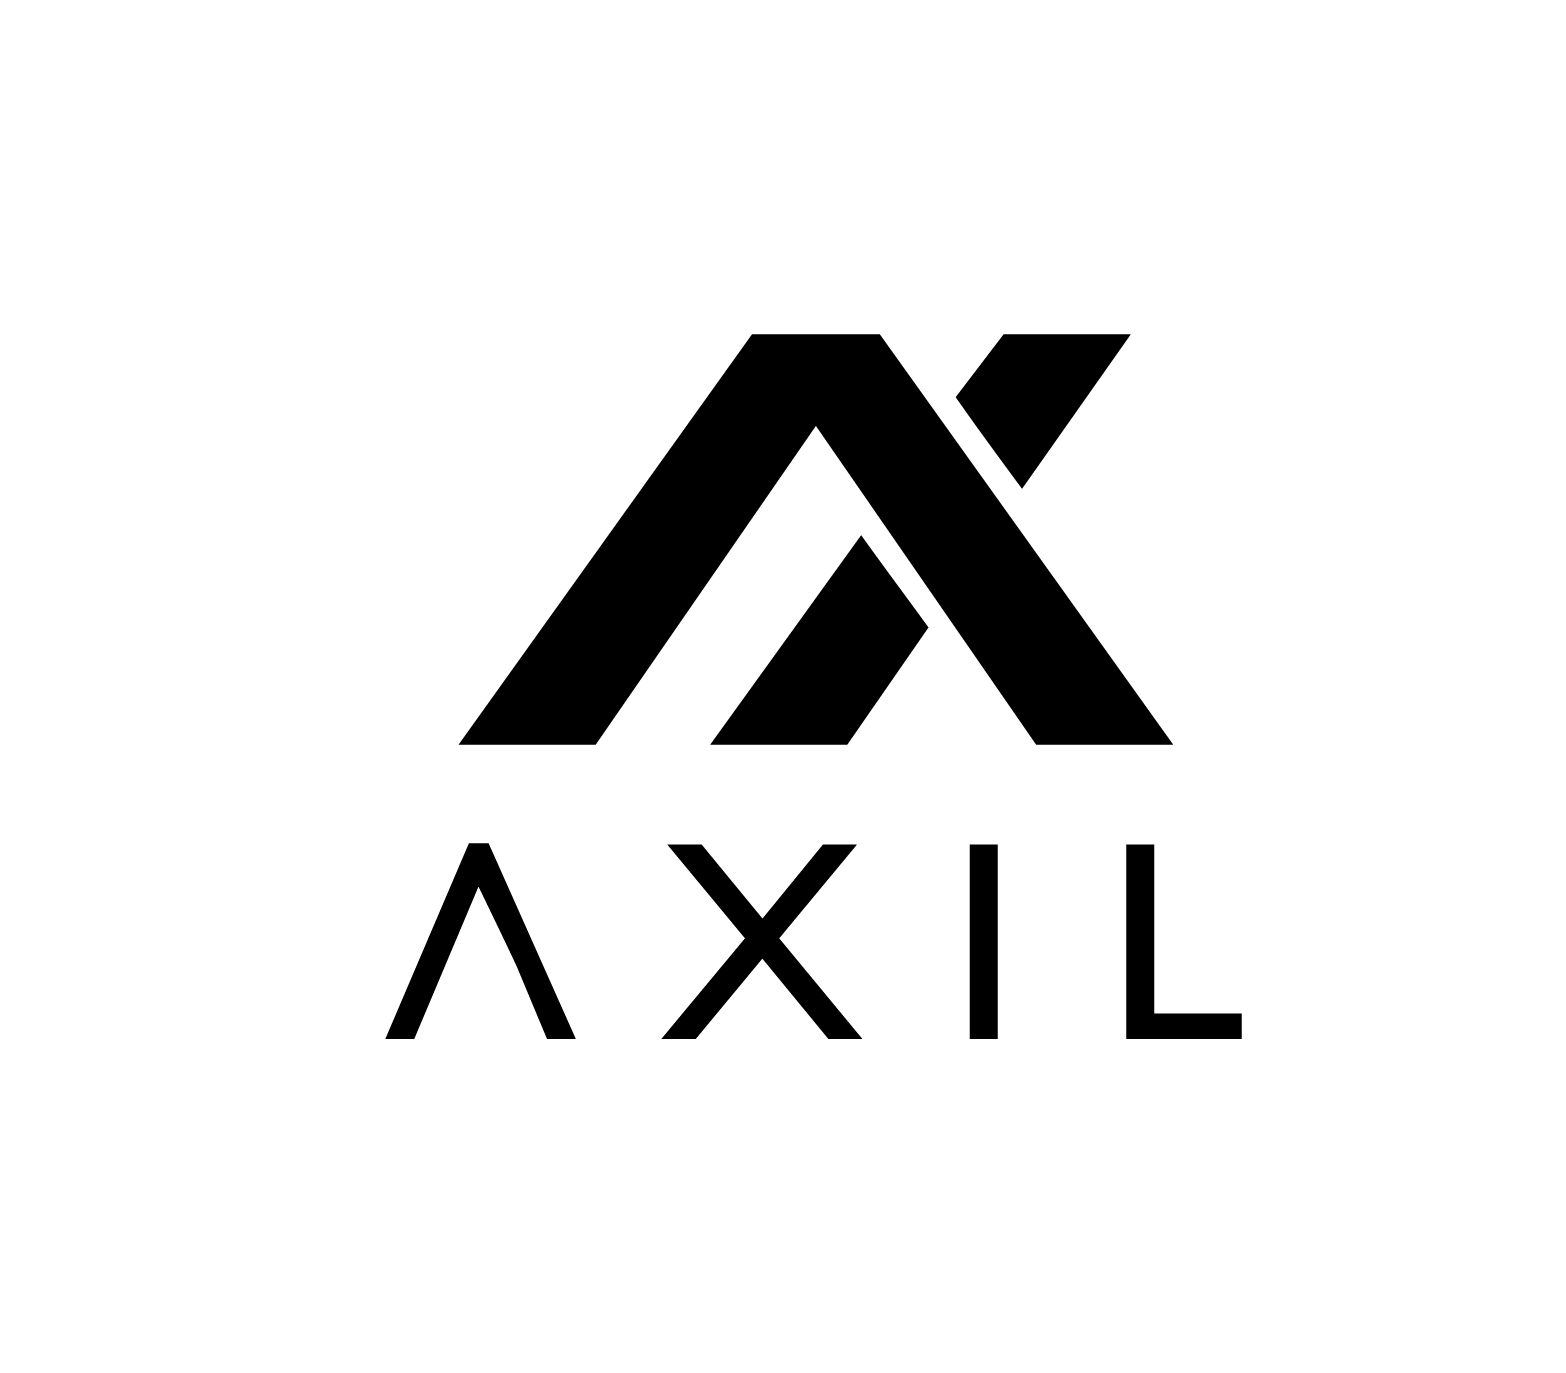 EarPro Discount Code: bullcreek